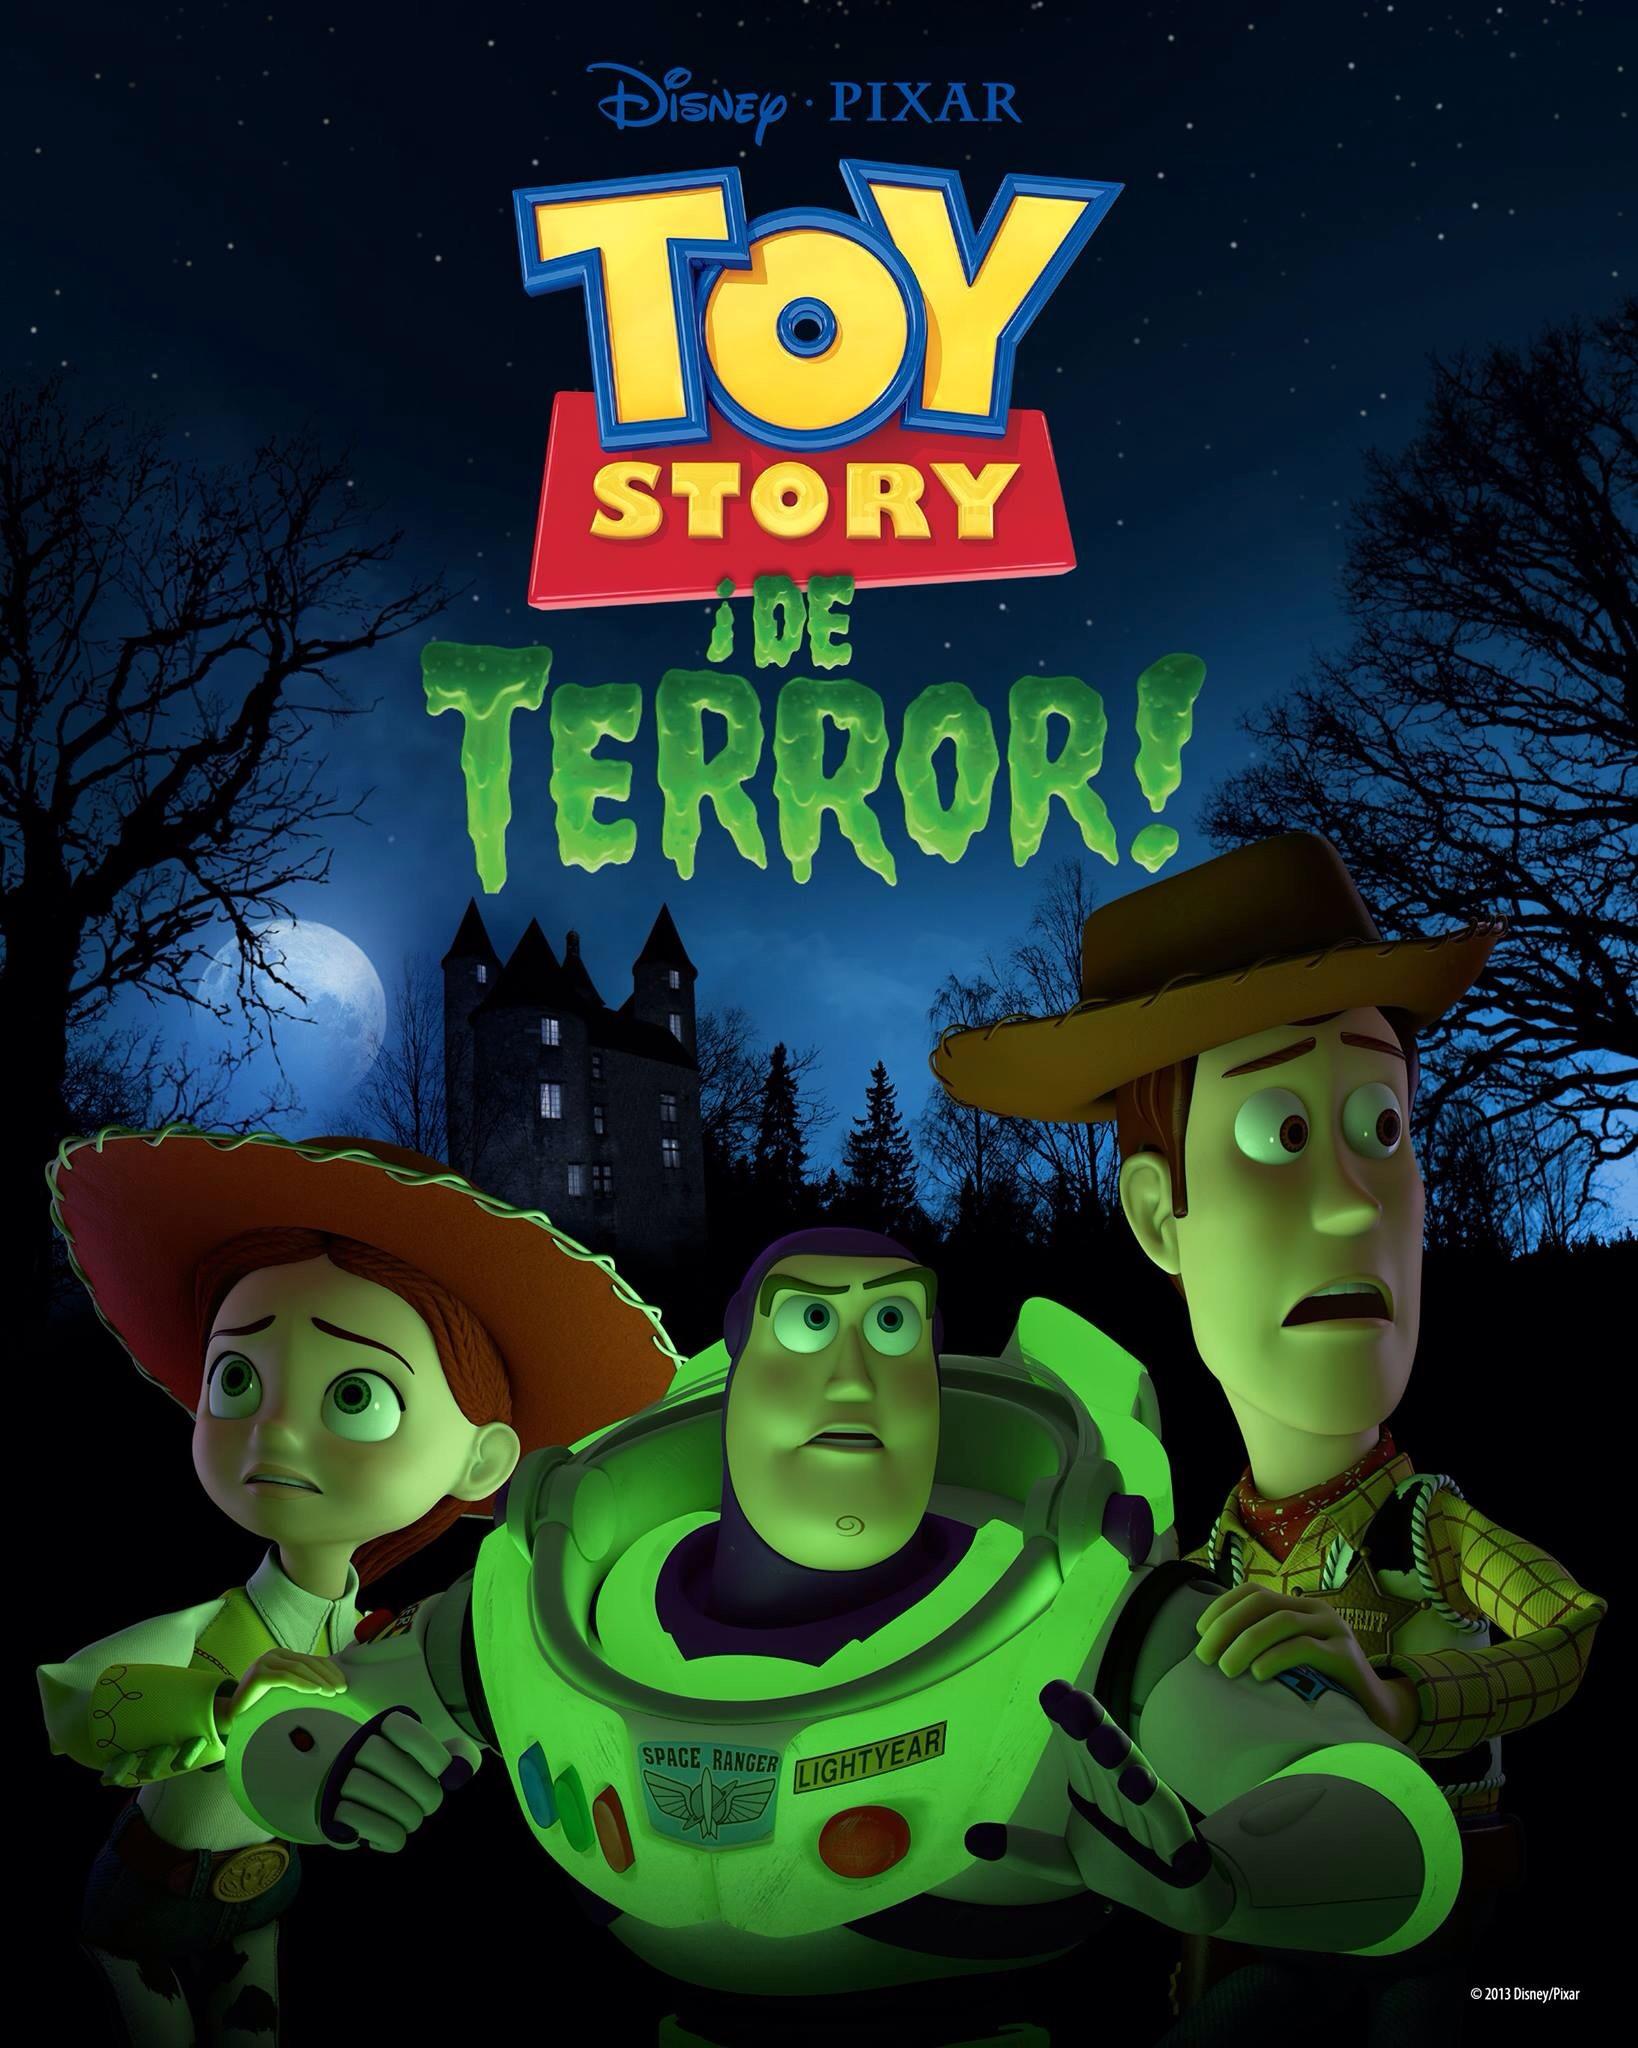 Toy story de terror latino dating